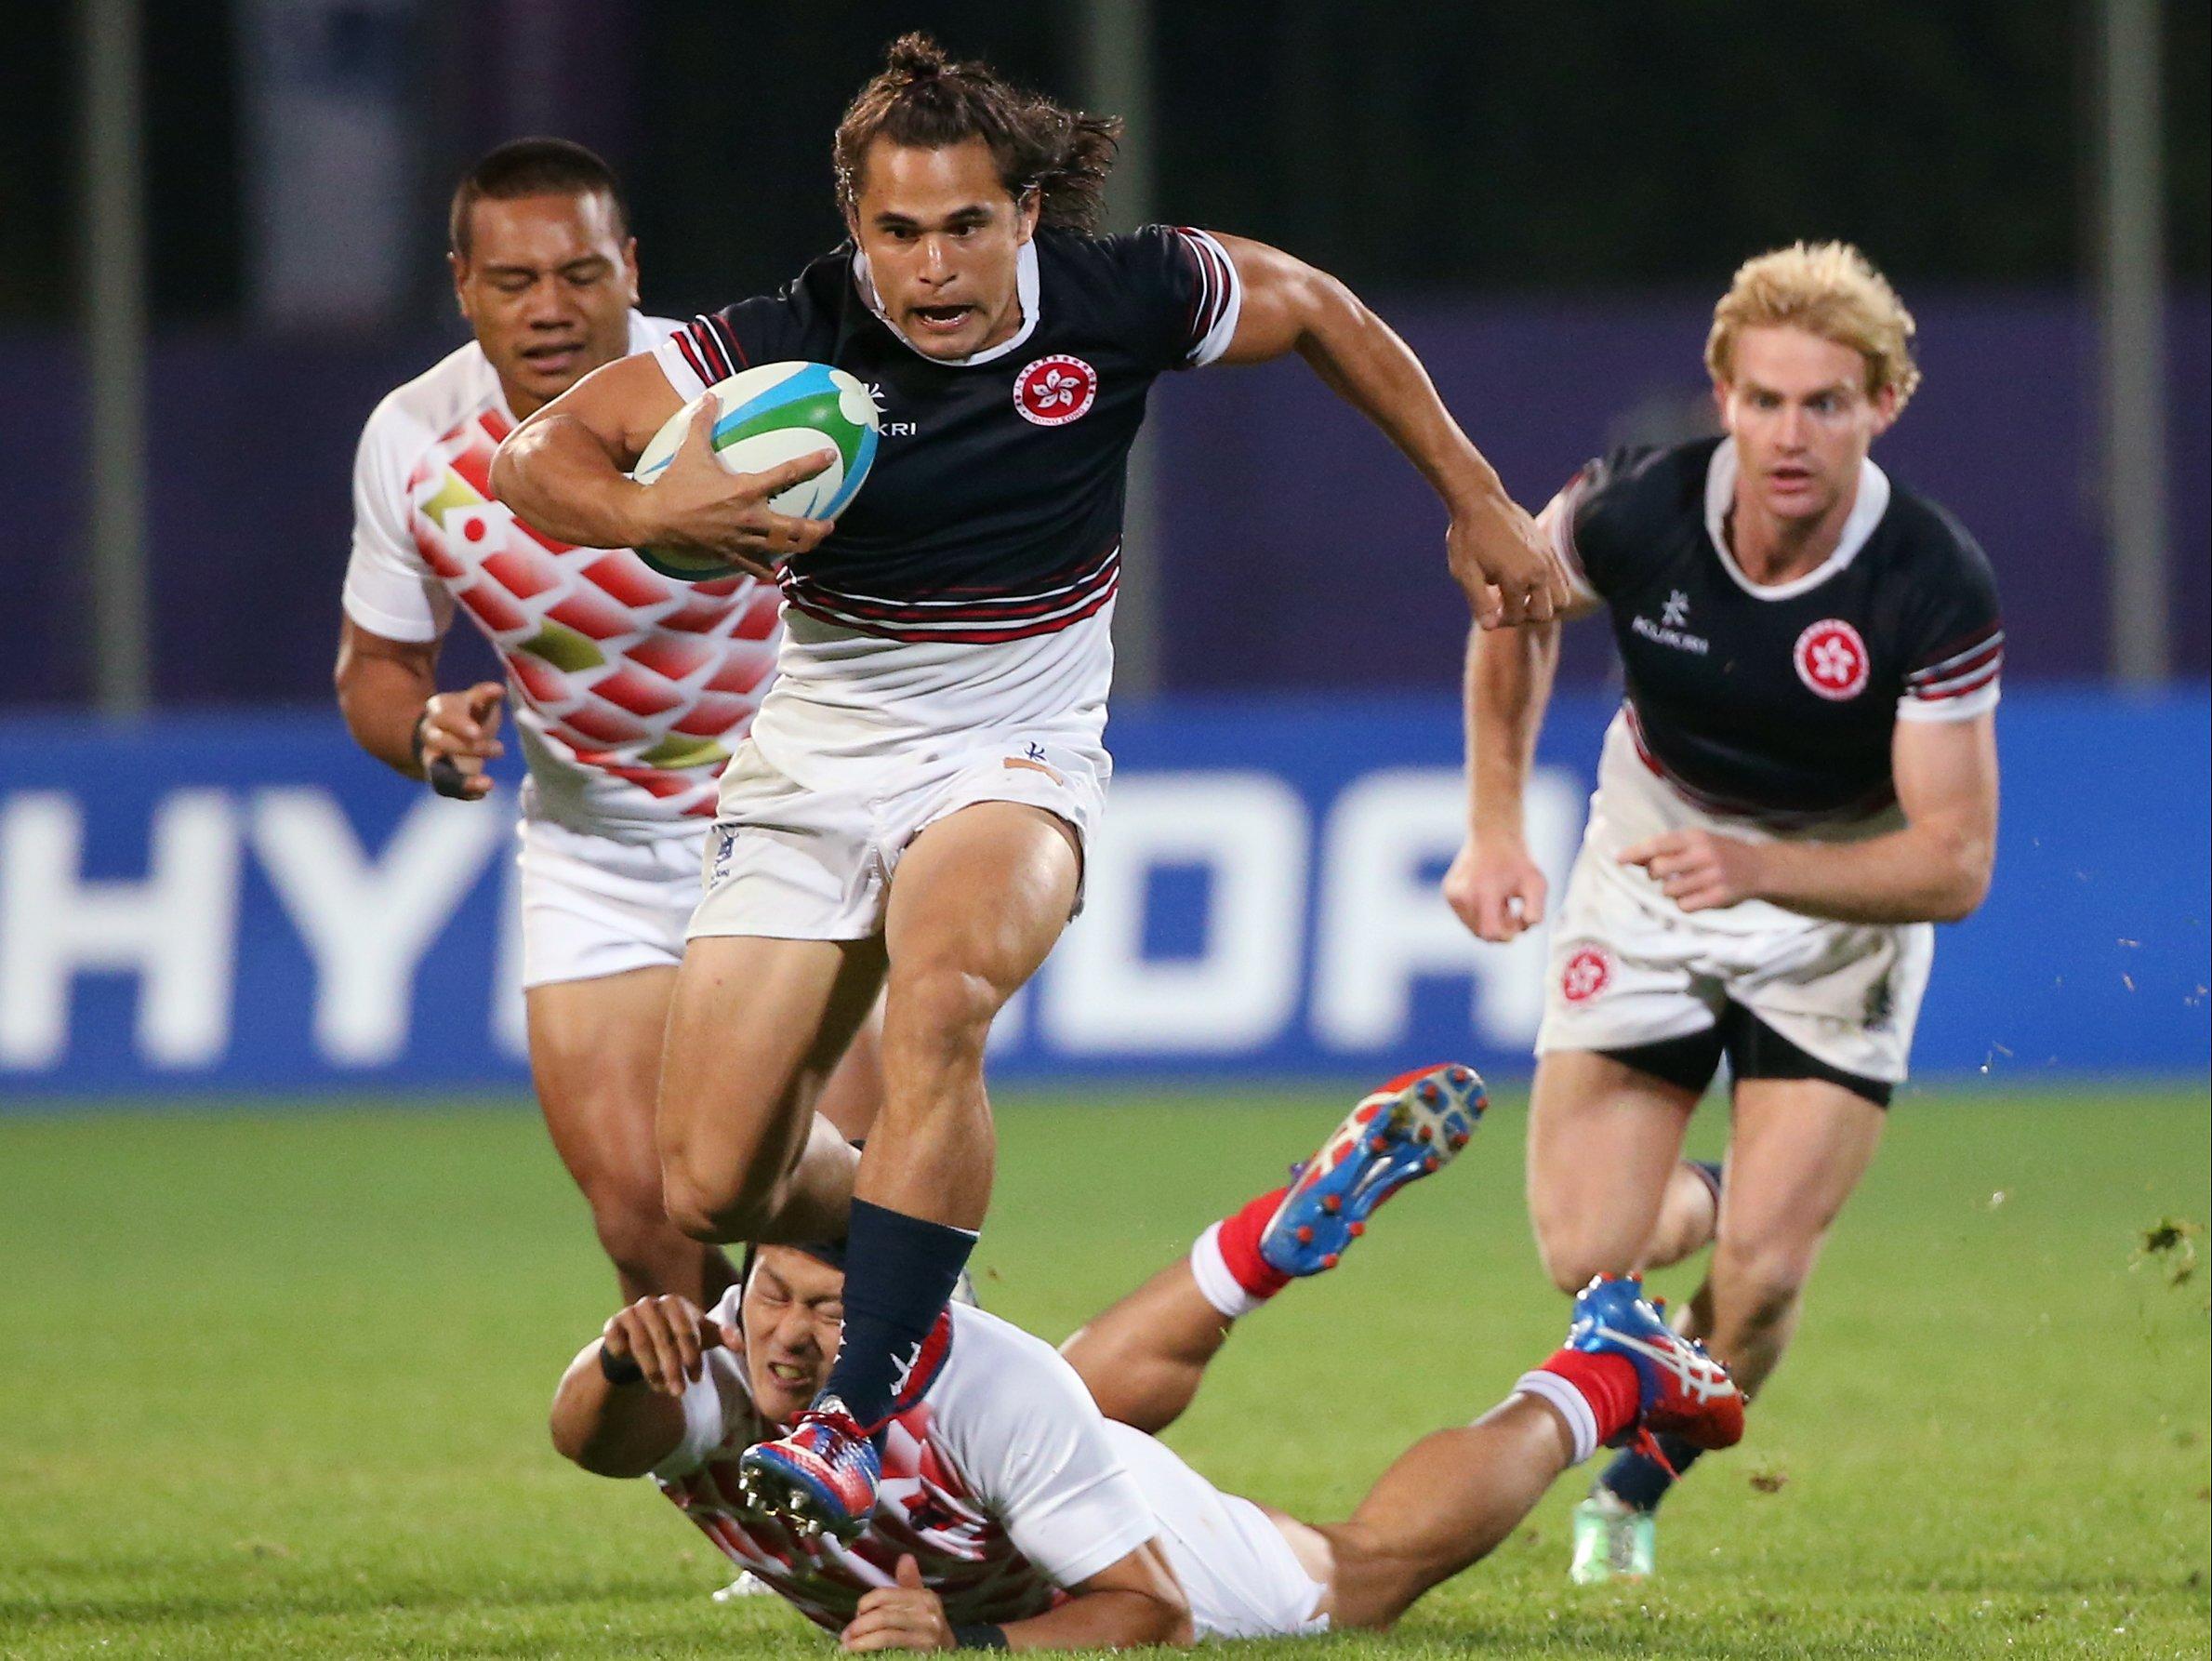 Scmp Oct Sp Rugby